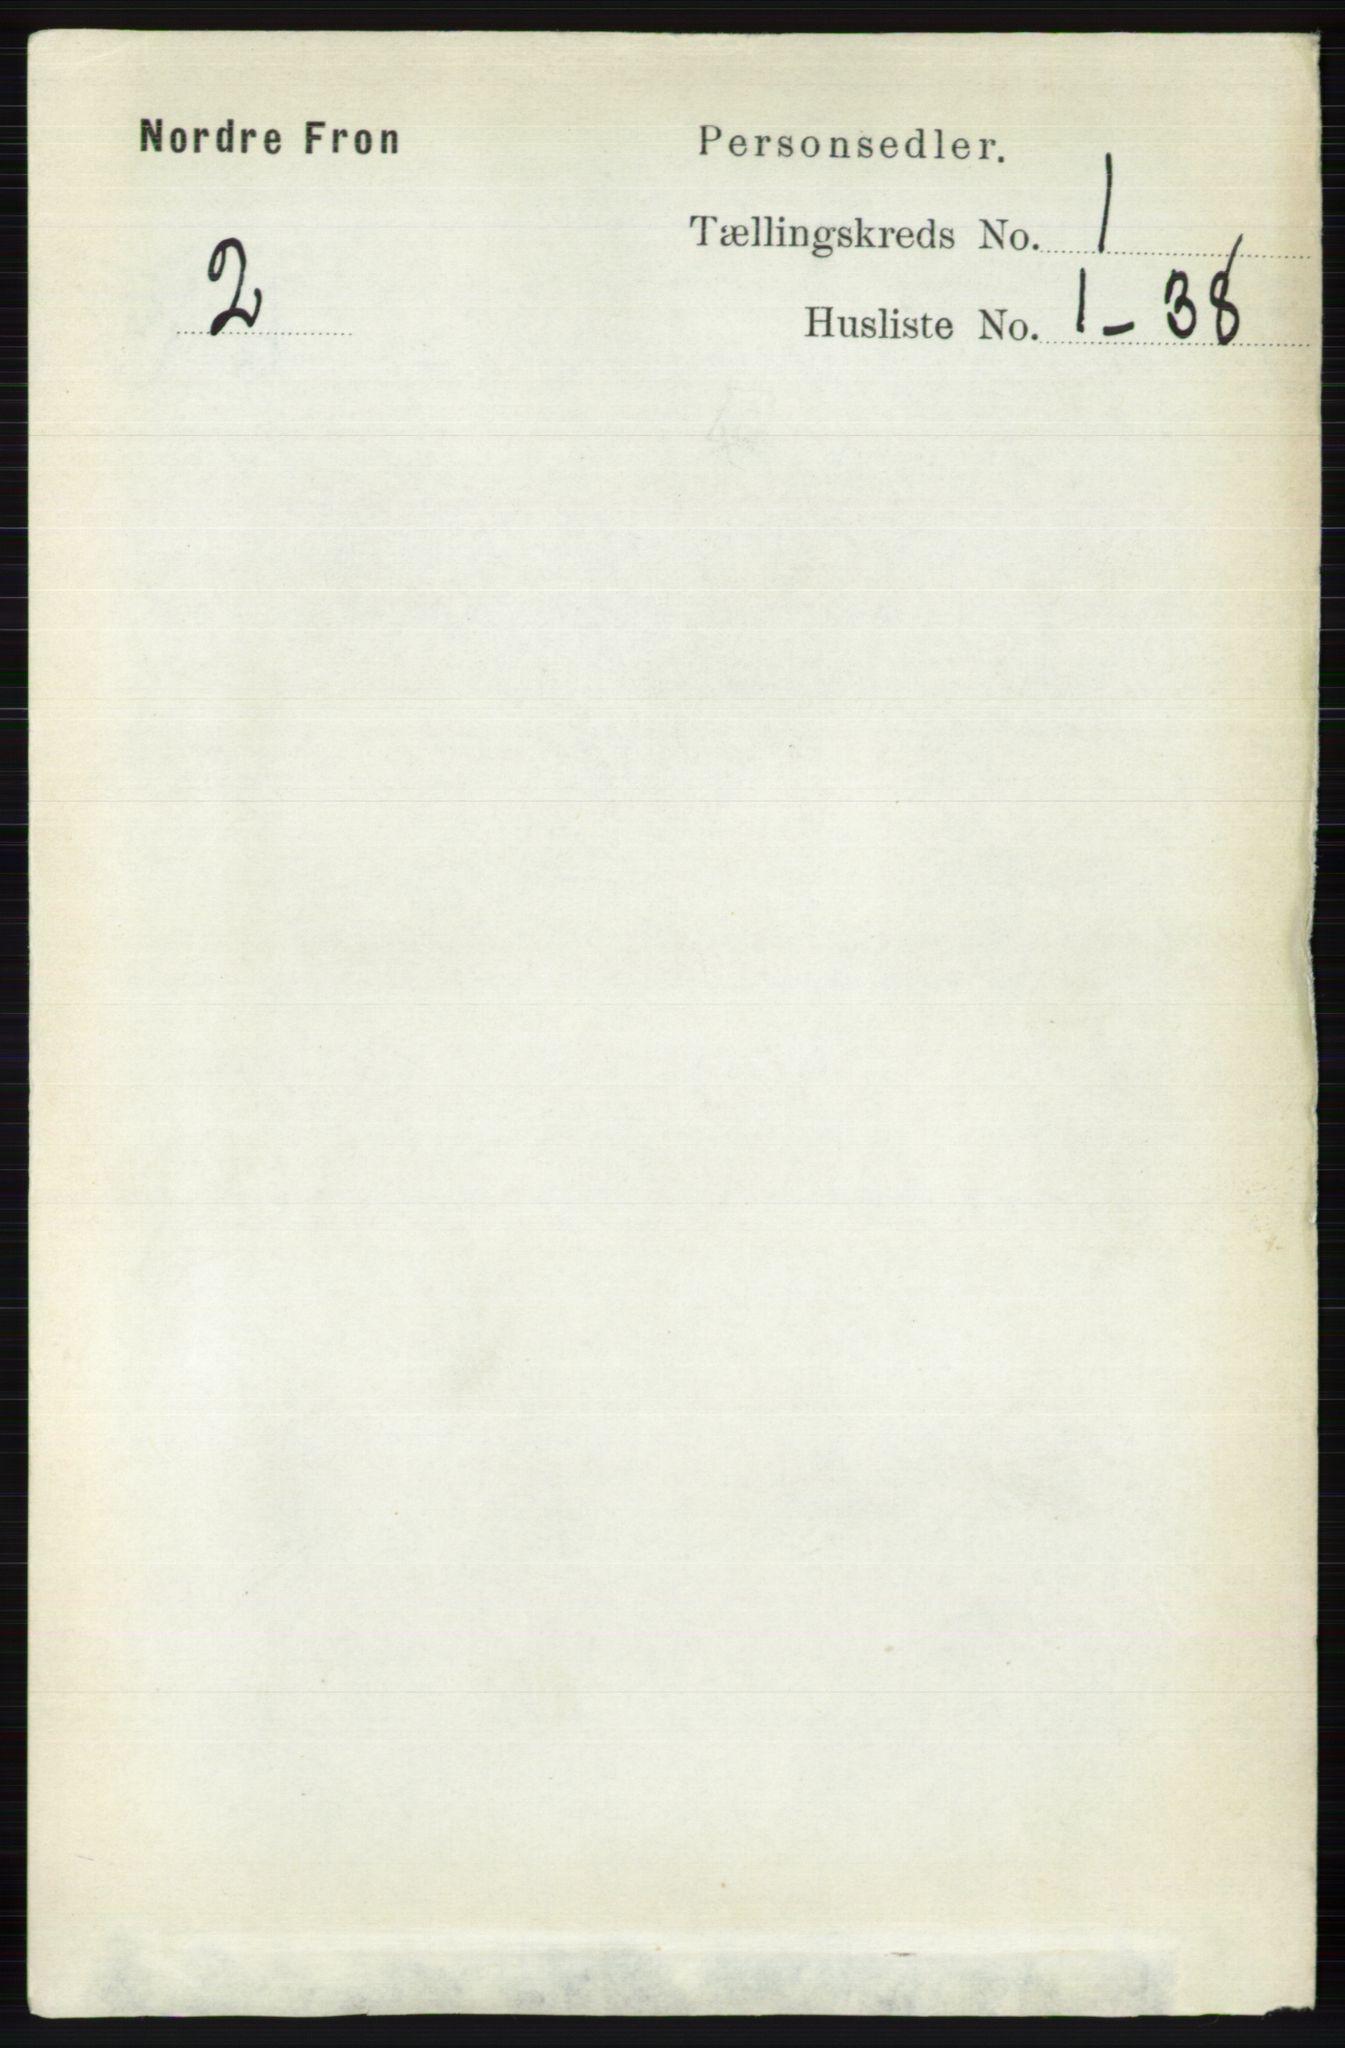 RA, Folketelling 1891 for 0518 Nord-Fron herred, 1891, s. 74